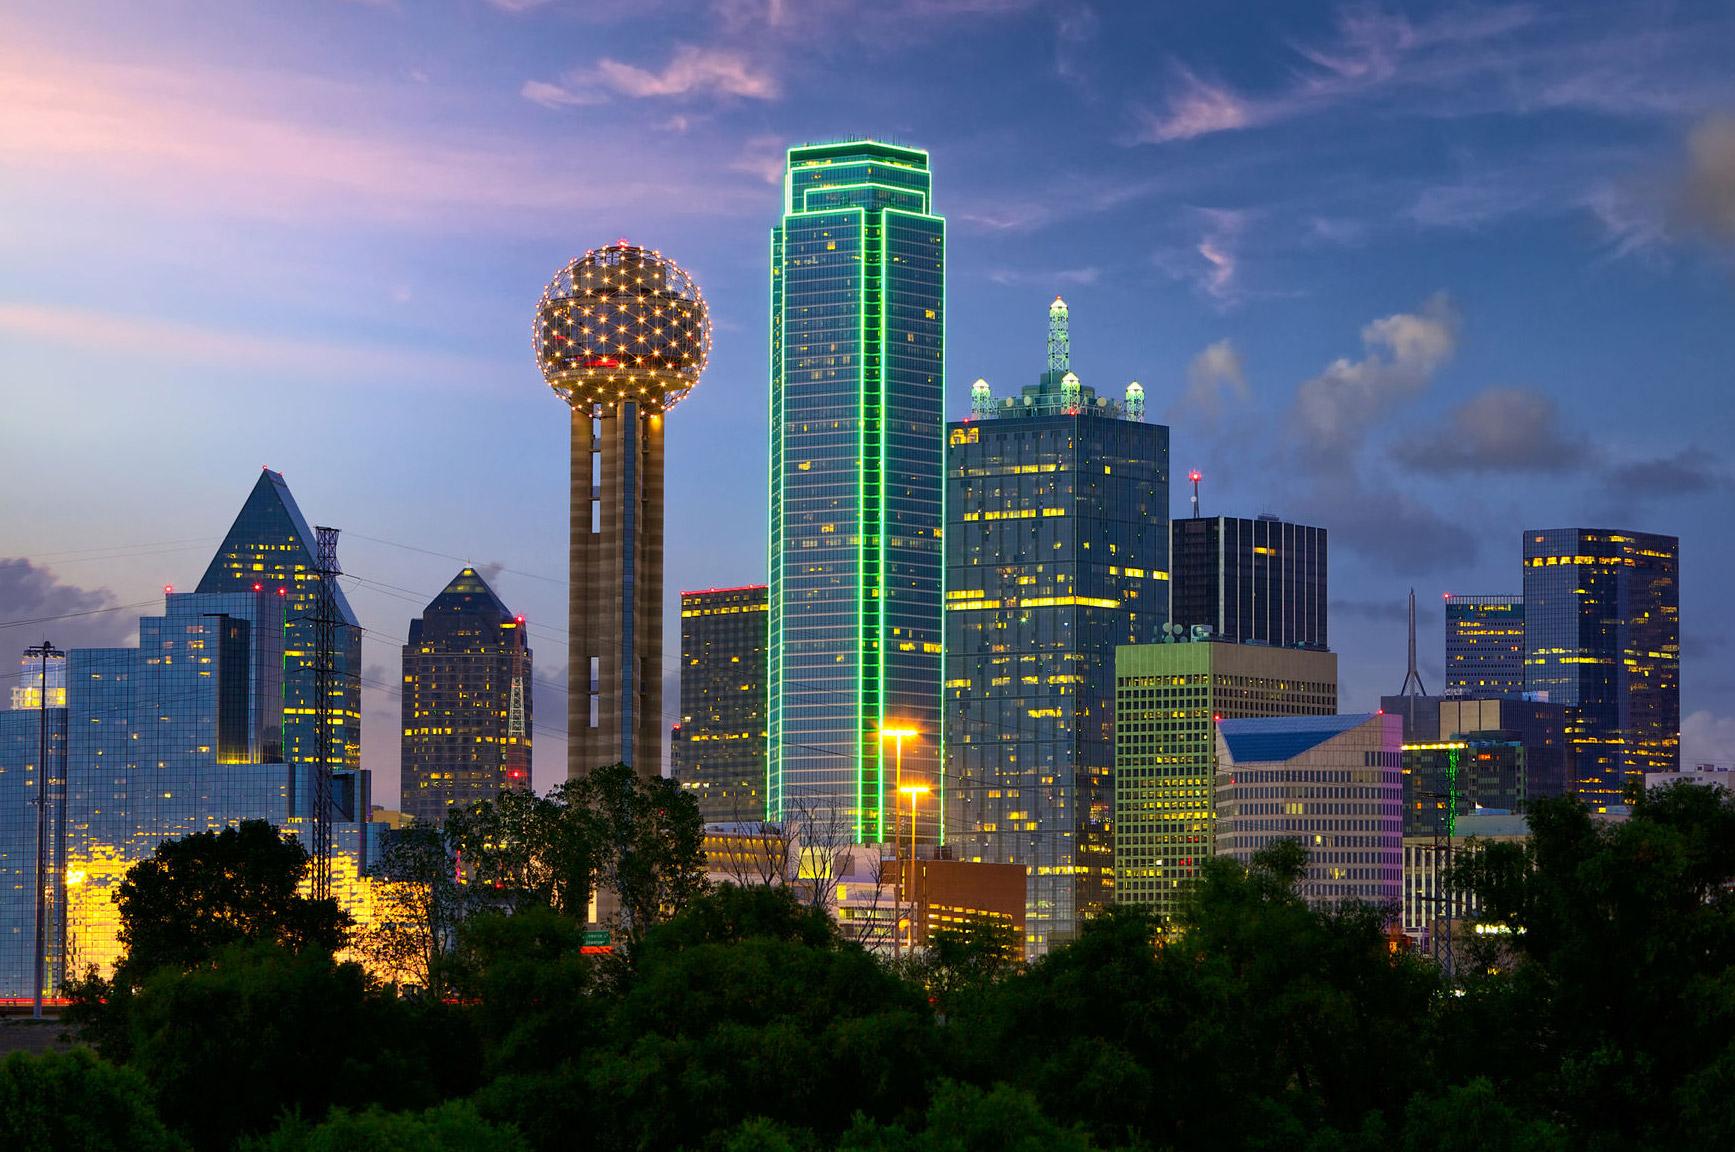 Dallas -Fort Worth Area Popular Destination for Families